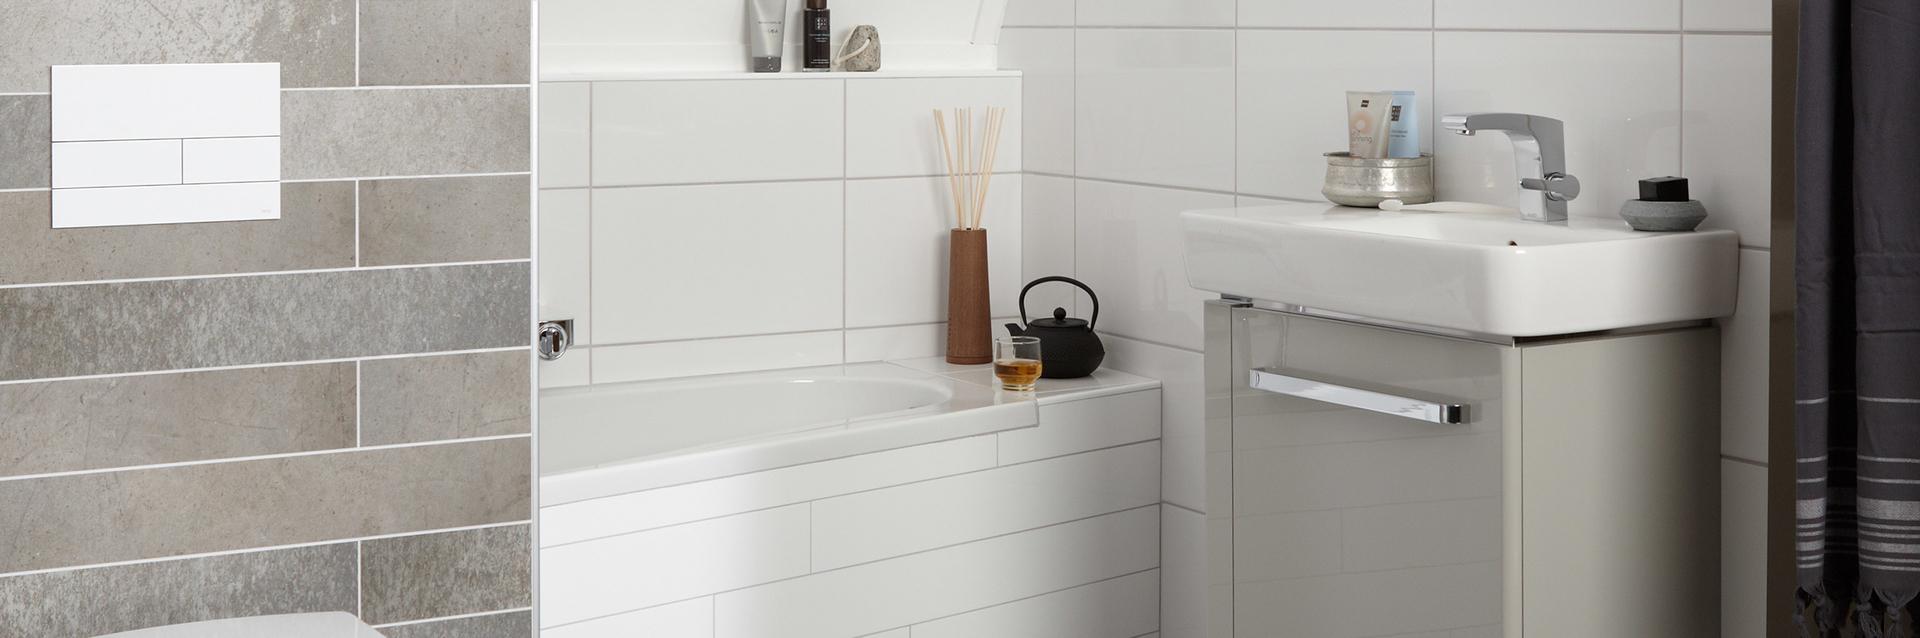 Kleine badkamer met bad - Kleine badkamer met bad